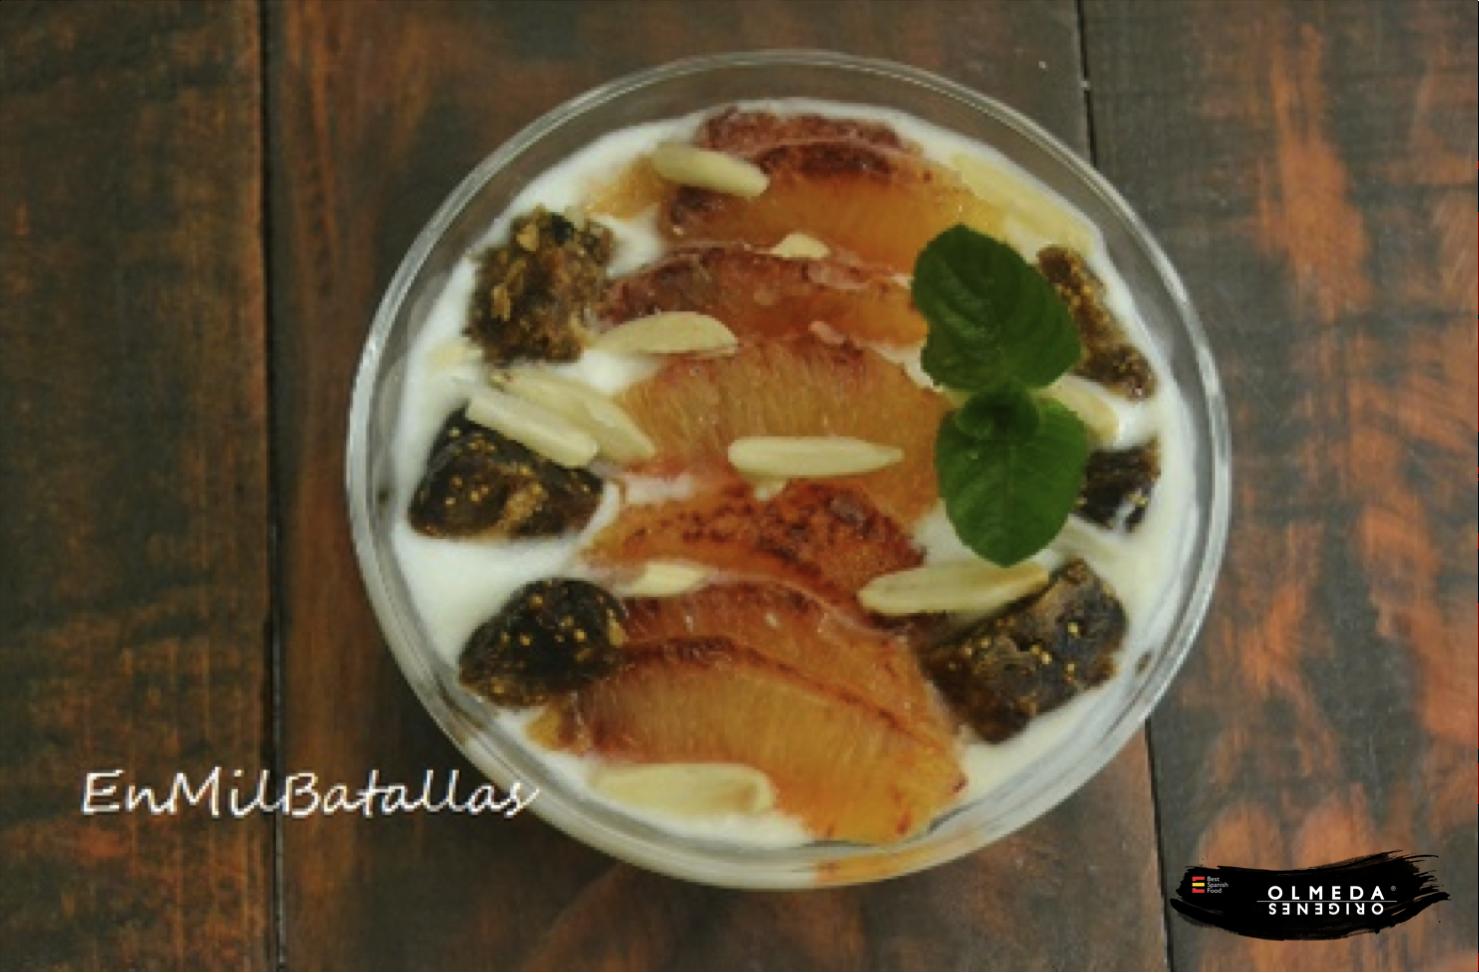 Olmeda_Origenes_dessert_arabic_higo